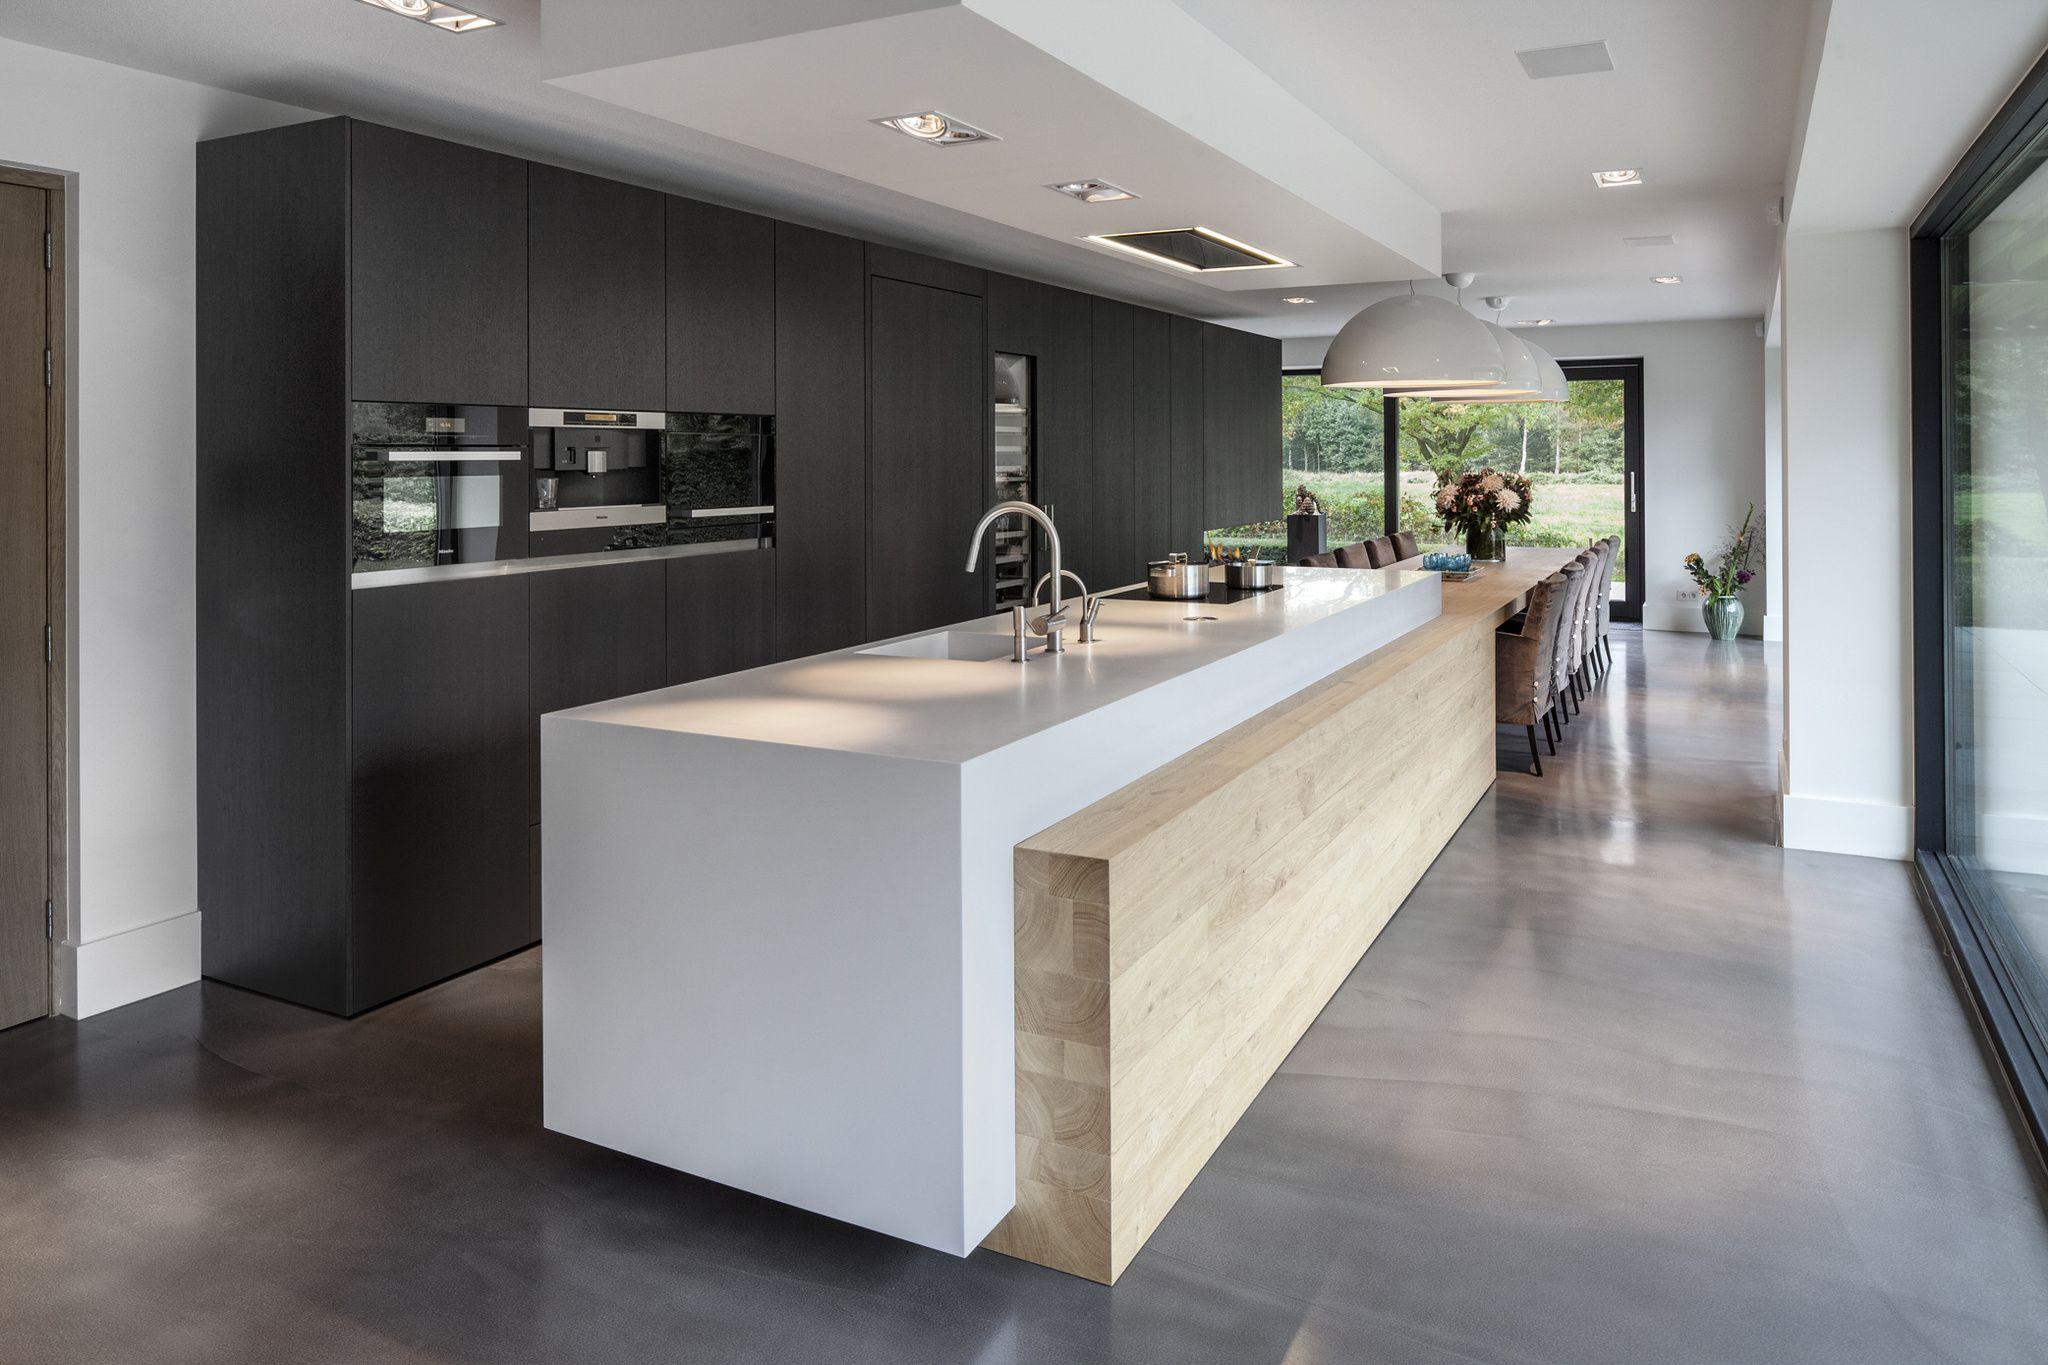 Moderne Keuken Grijs : De mooiste moderne keukens arredamento d interni